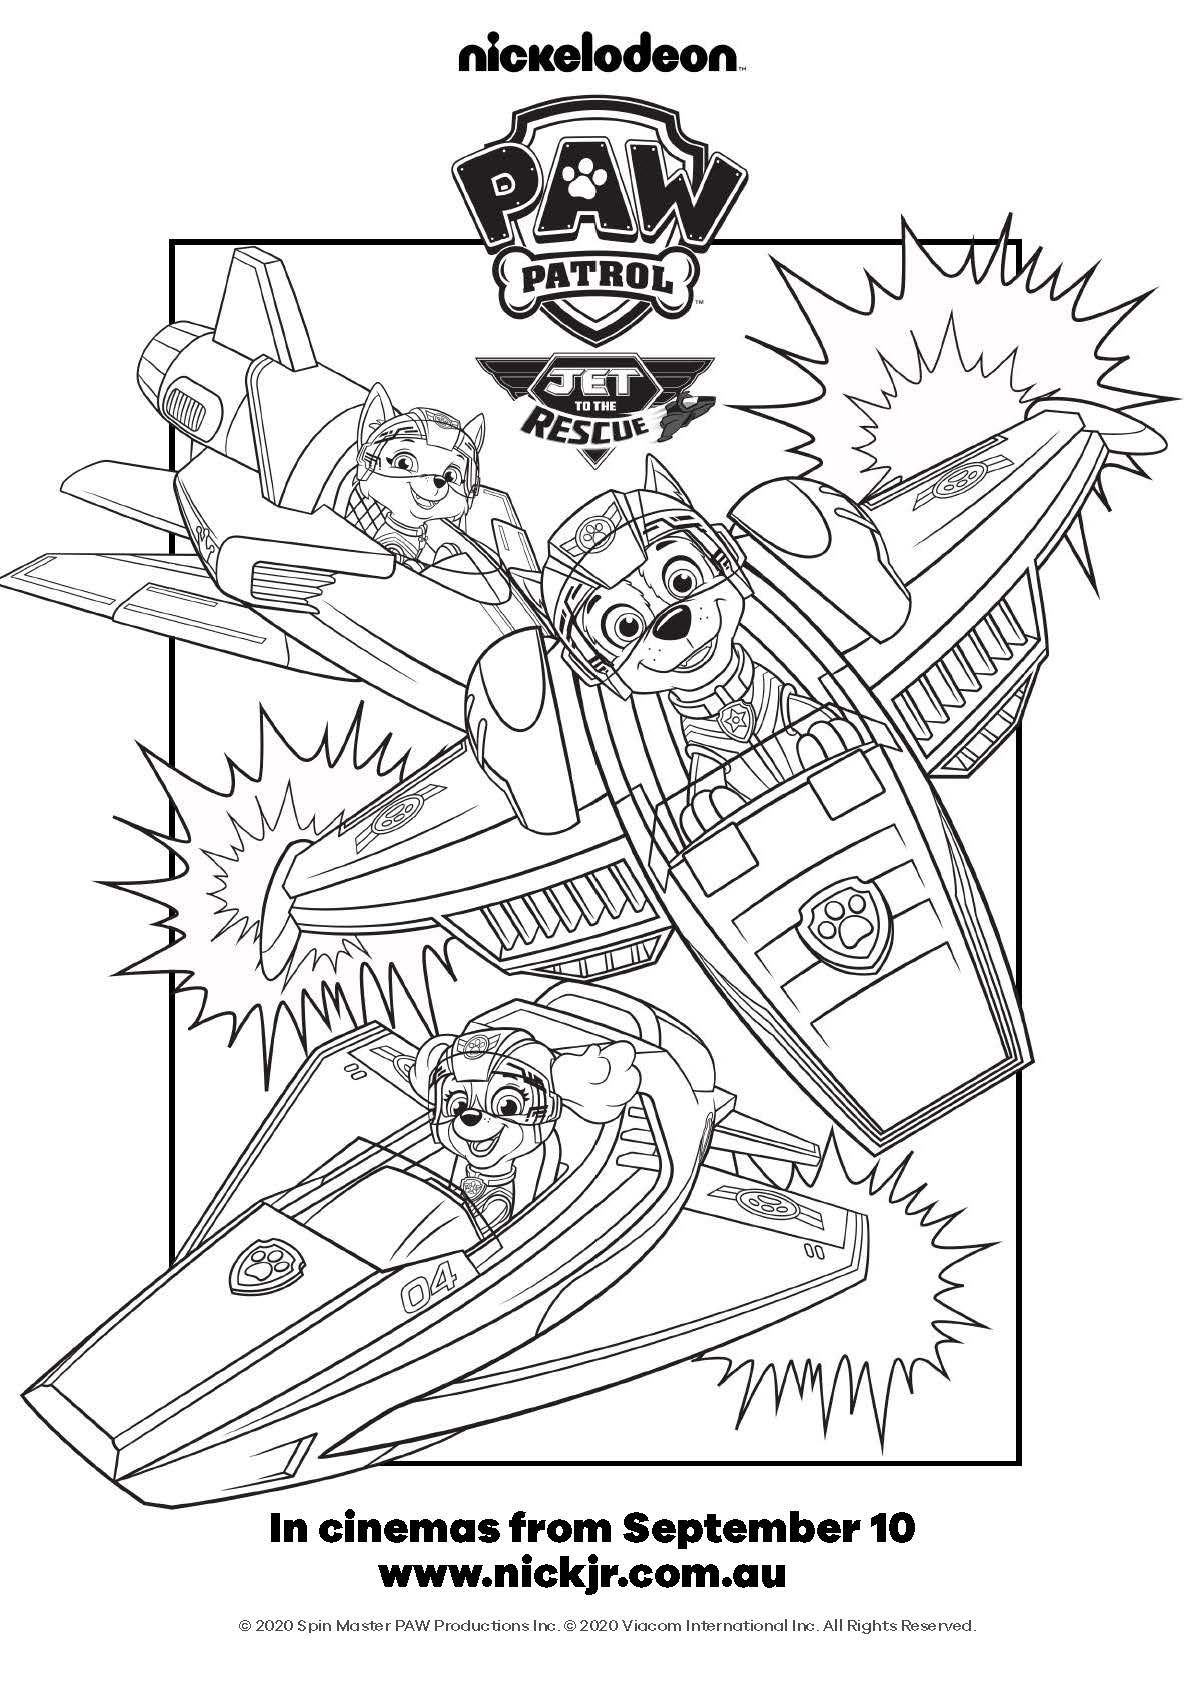 Paw Patrol Jet To The Rescue : patrol, rescue, PATROL:, RESCUE, Colouring-in, Sheet, Patrol, Coloring,, Patrol,